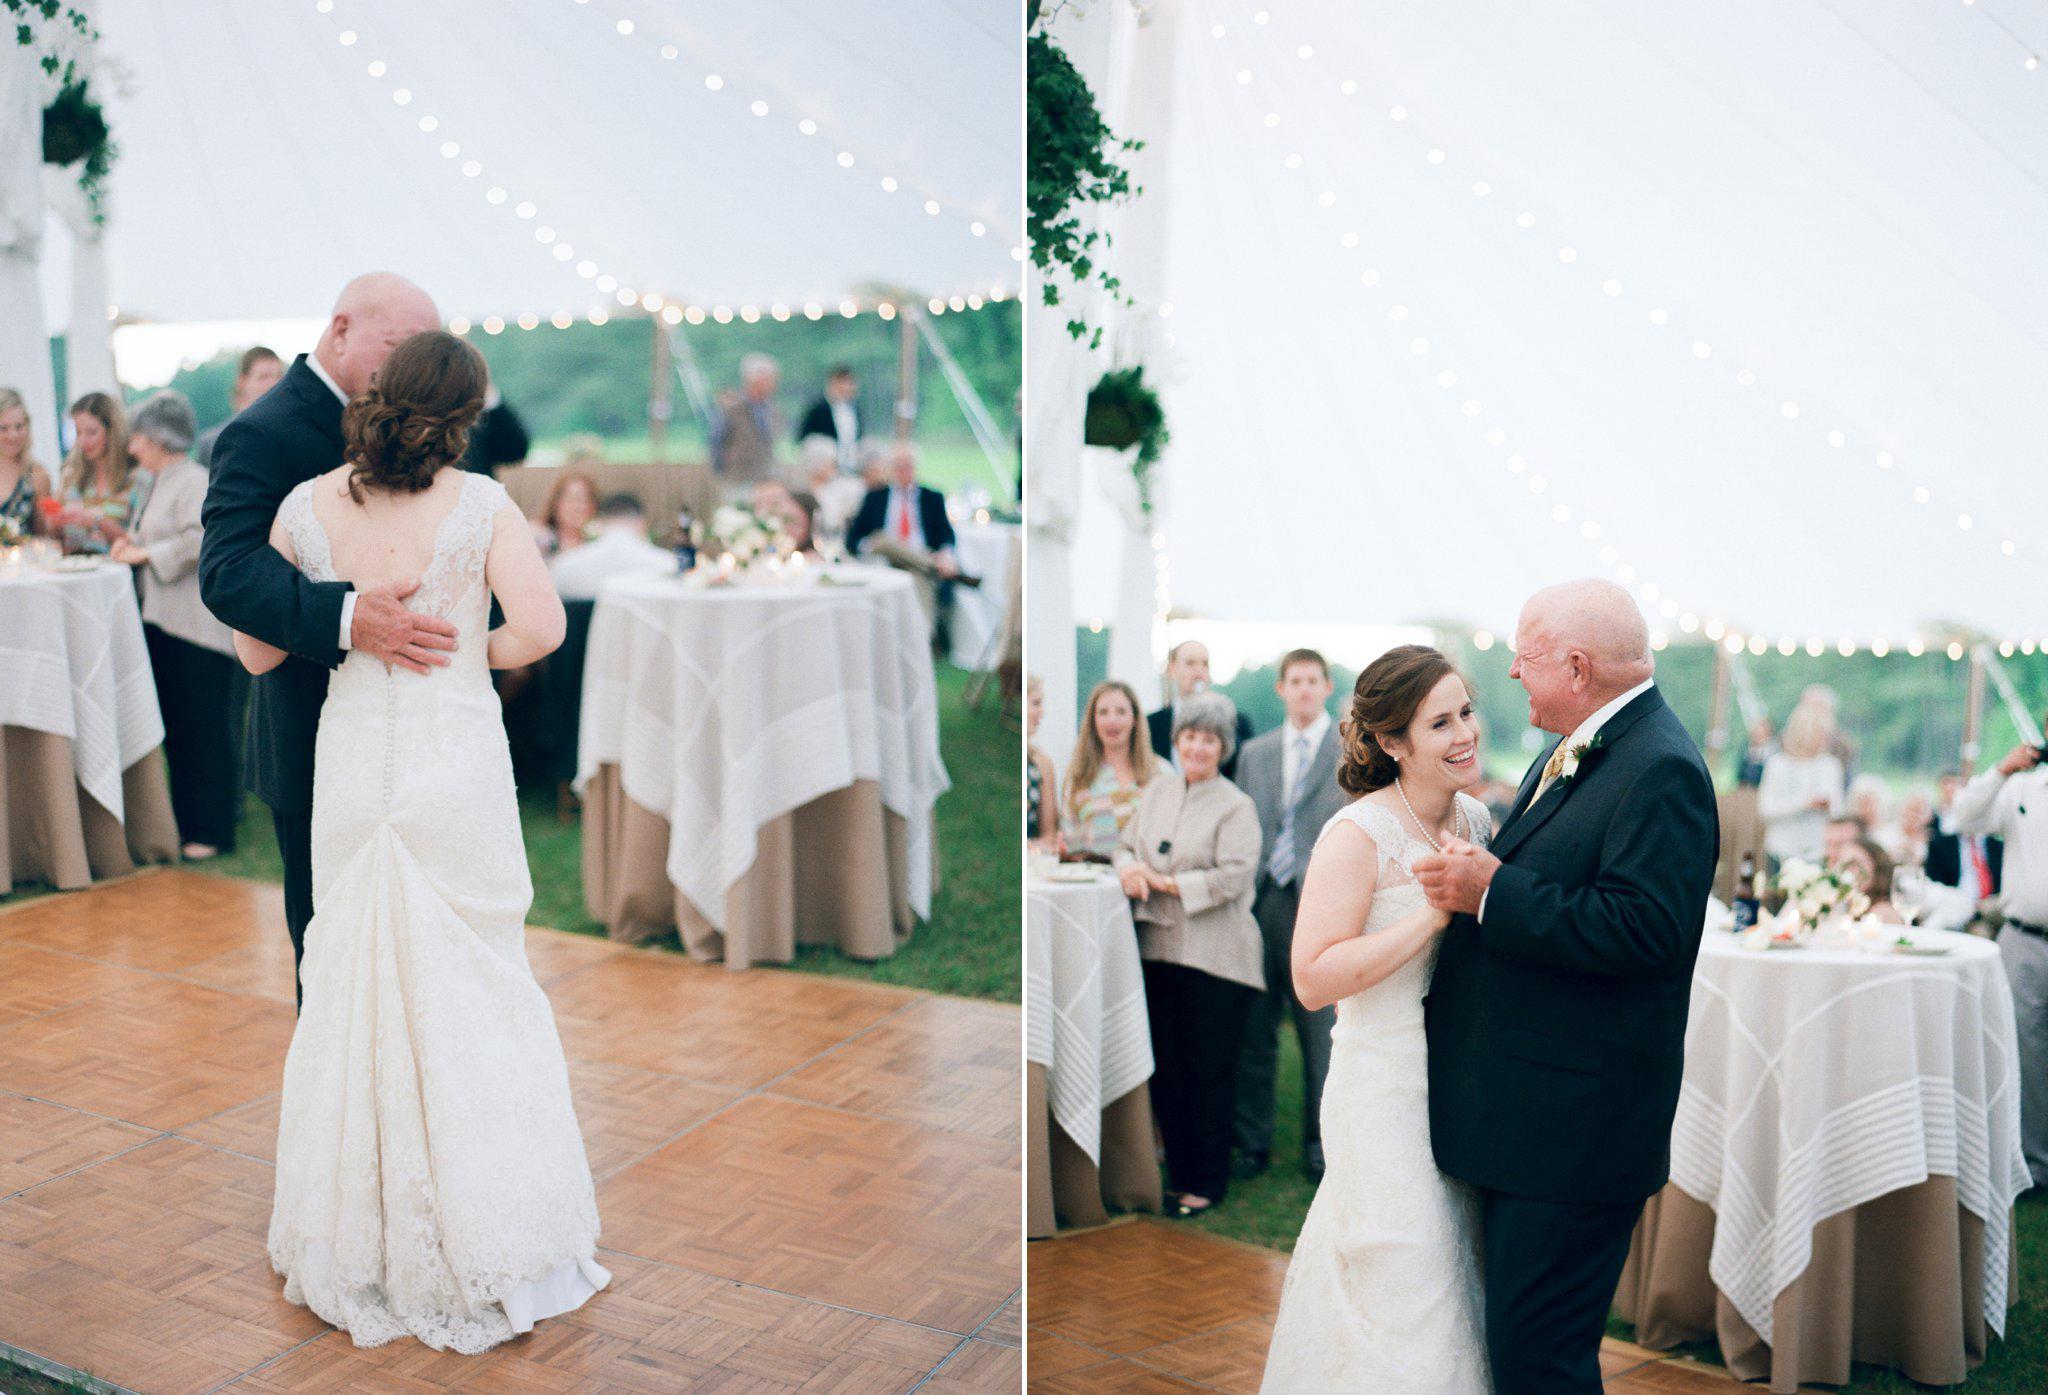 ecila farm wedding albany georgia wedding photographer shannon griffin photography-71.jpg